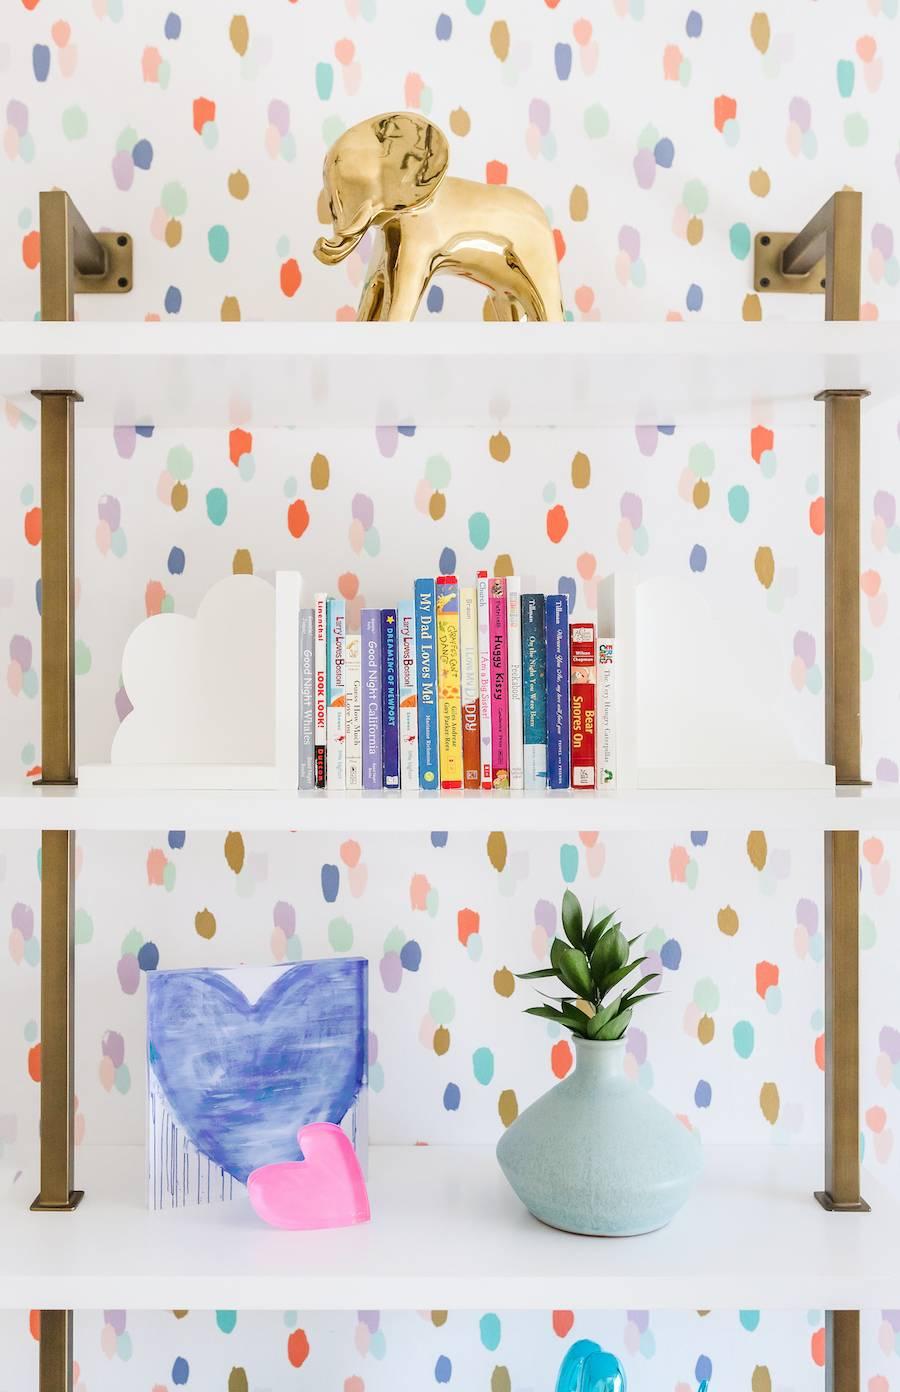 Colorful Nursery Bookshelf Decor and Styling